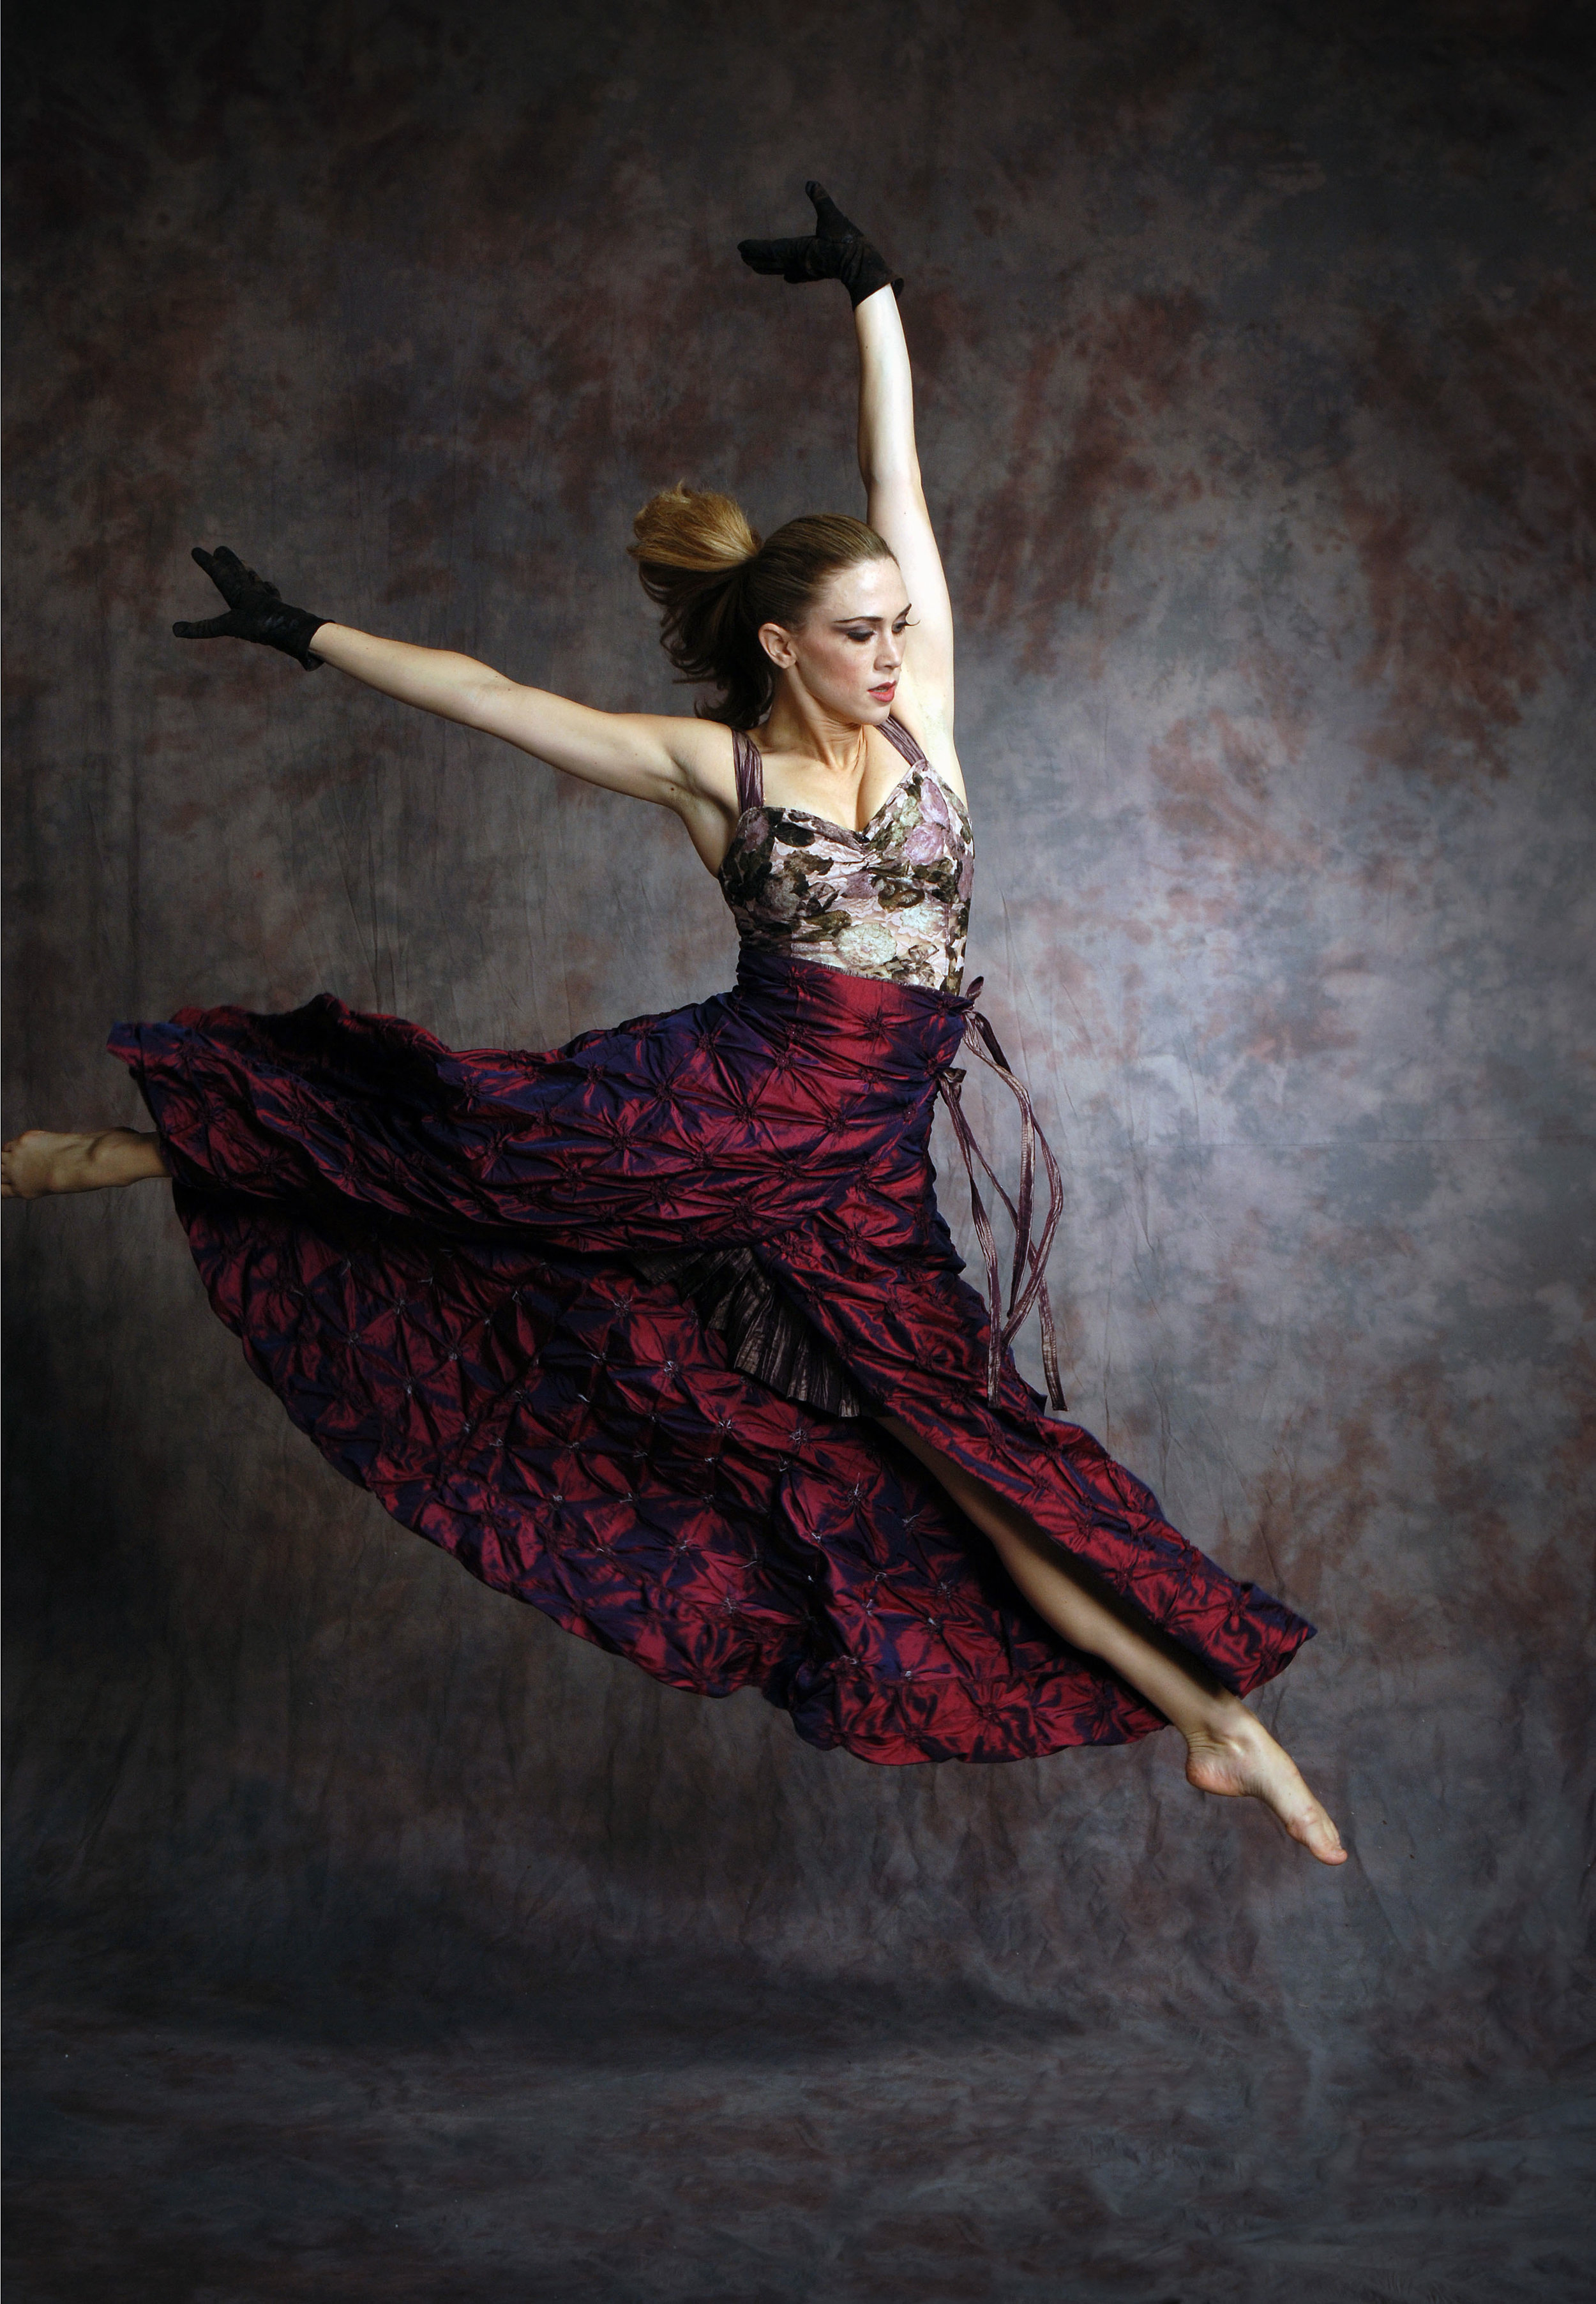 DESIREE DUNBAR BY GREG EHLERS | COURTESY DANCERS DANCING